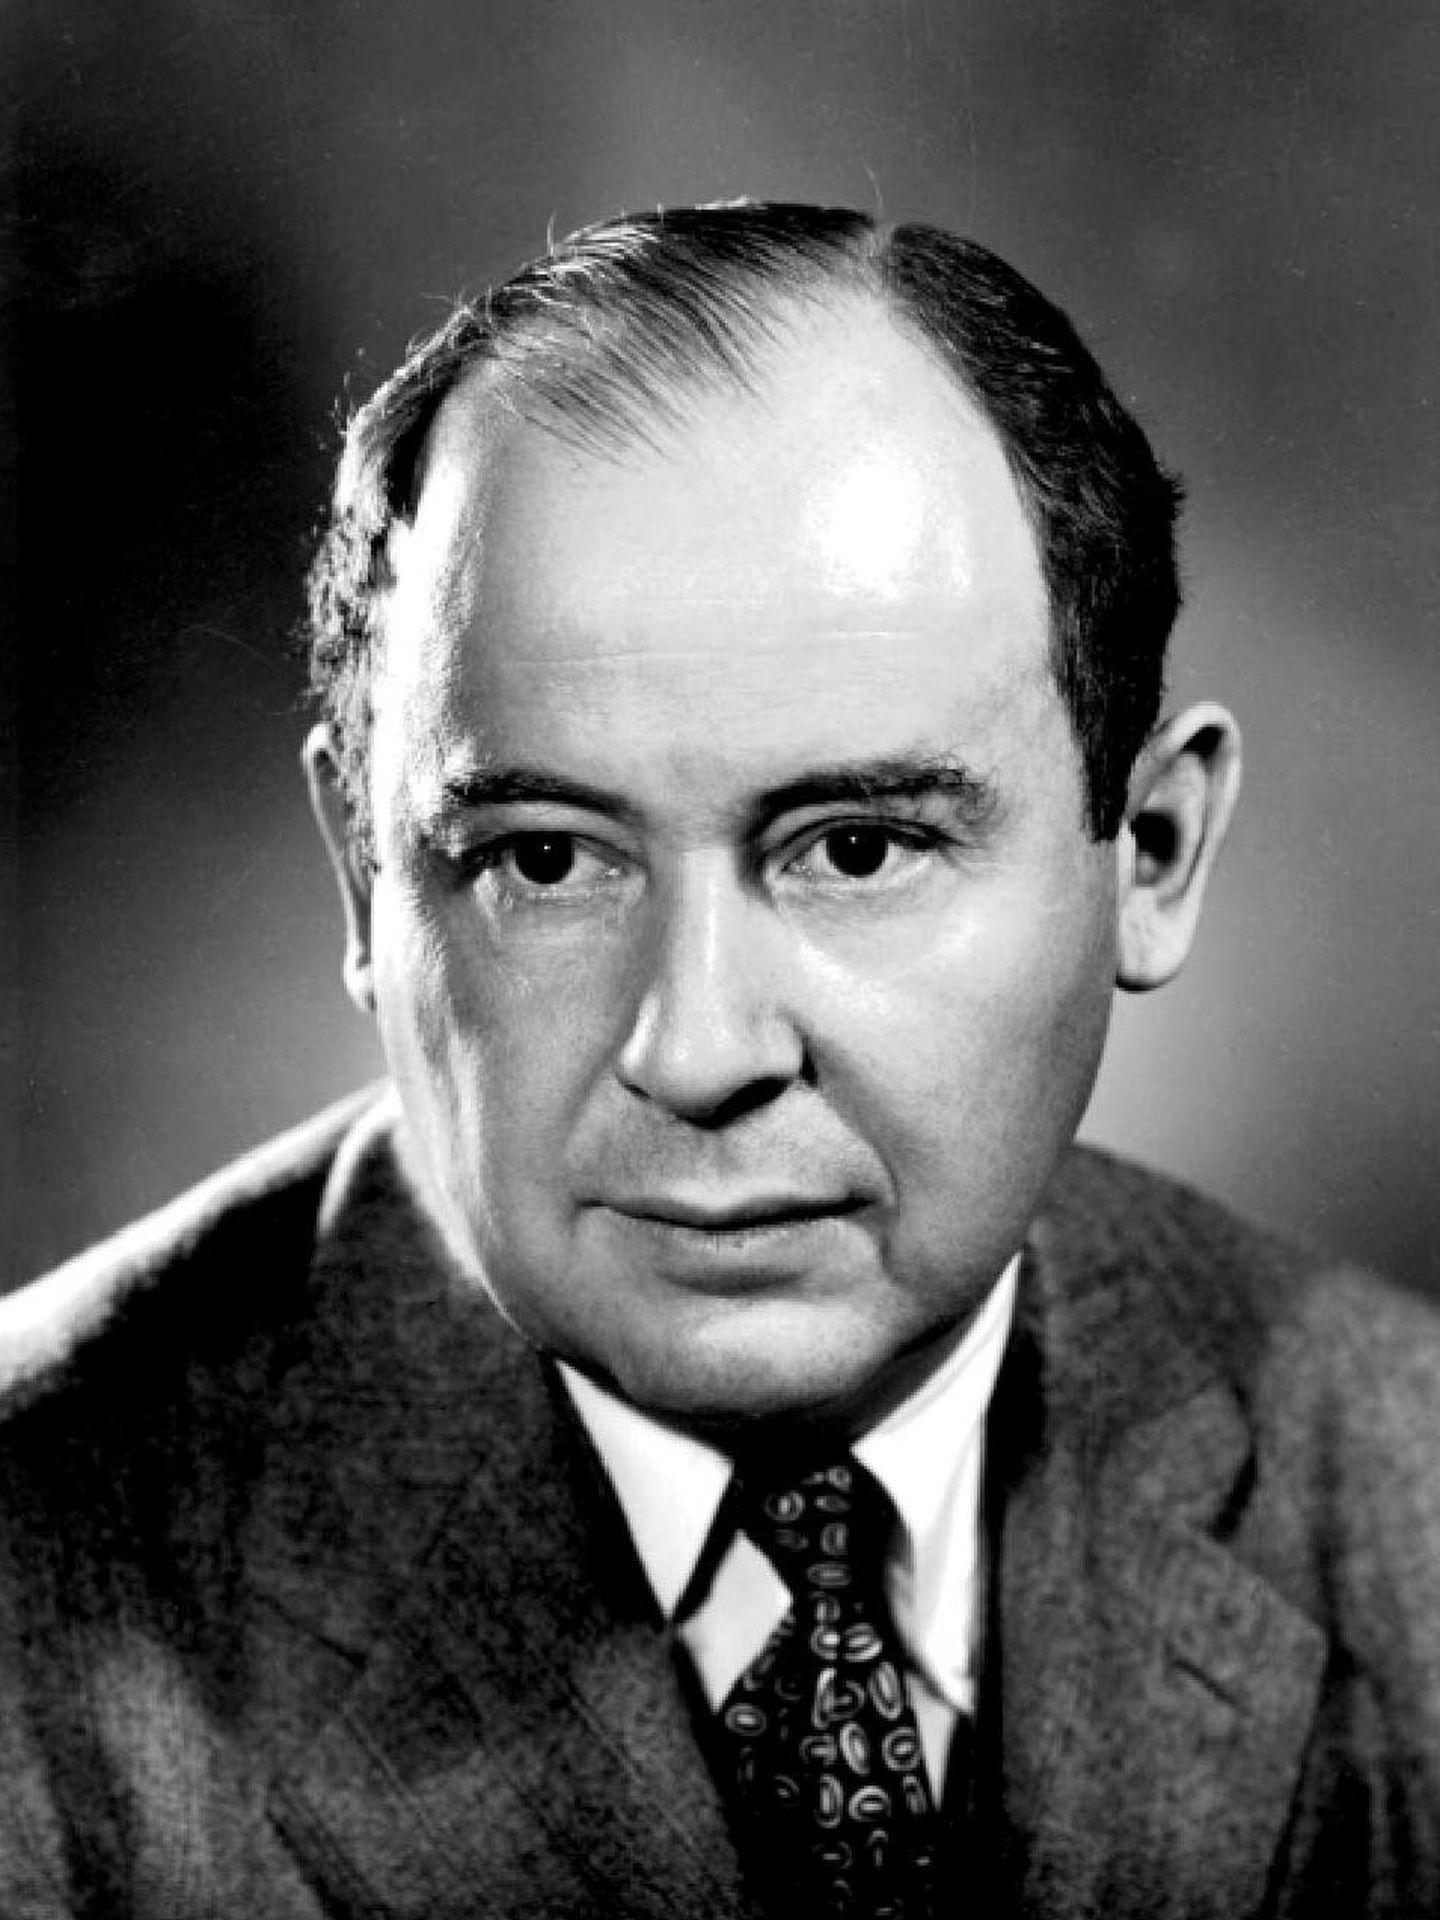 John von Neumann (Wikimedia Commons)